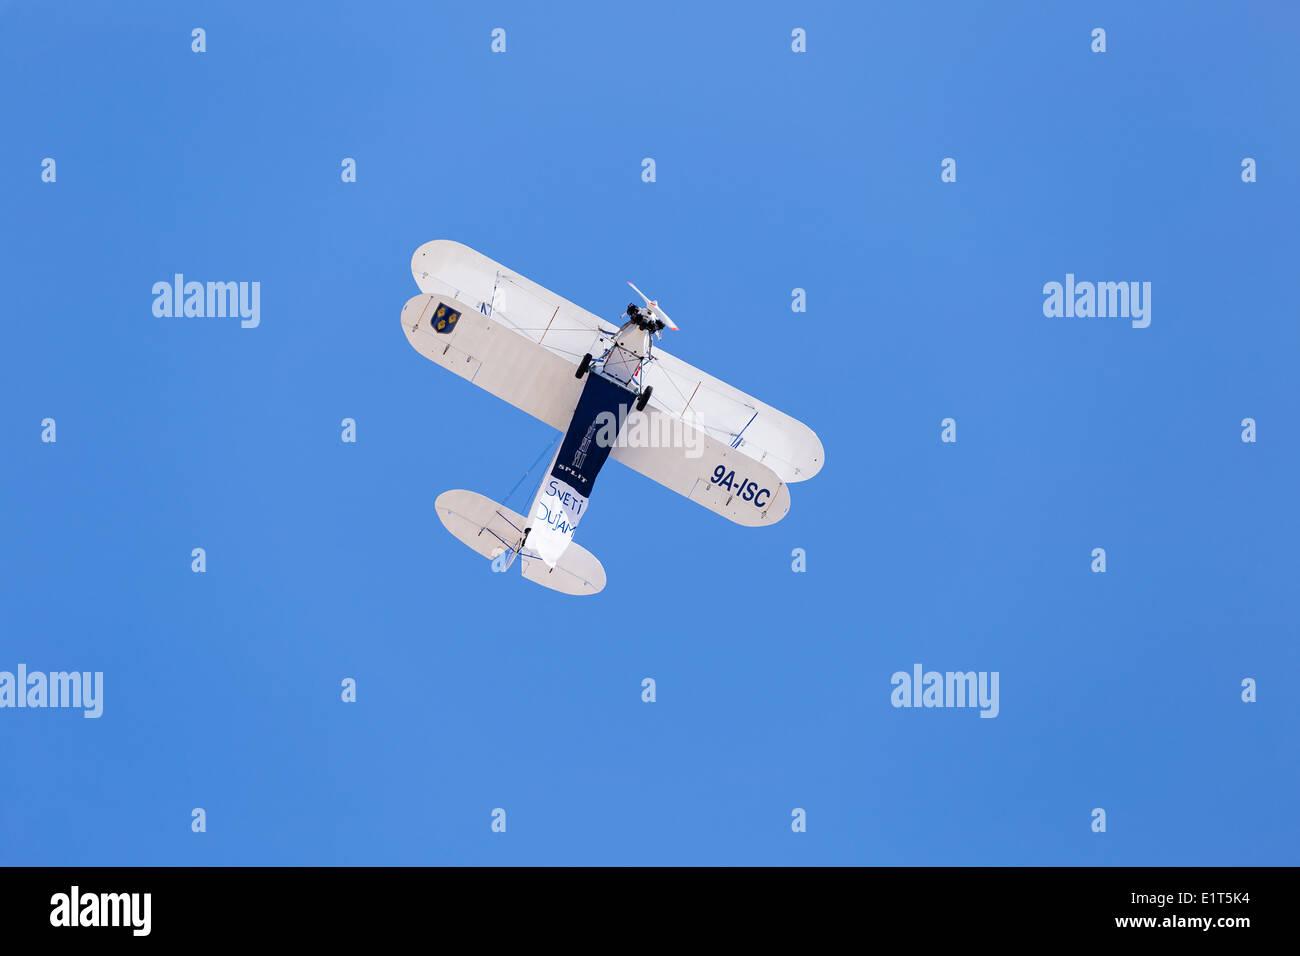 A bi-plane aircraft flies over riva trailing a banner for Sveti Dujam during the sudamja celebrations in split croatia - Stock Image